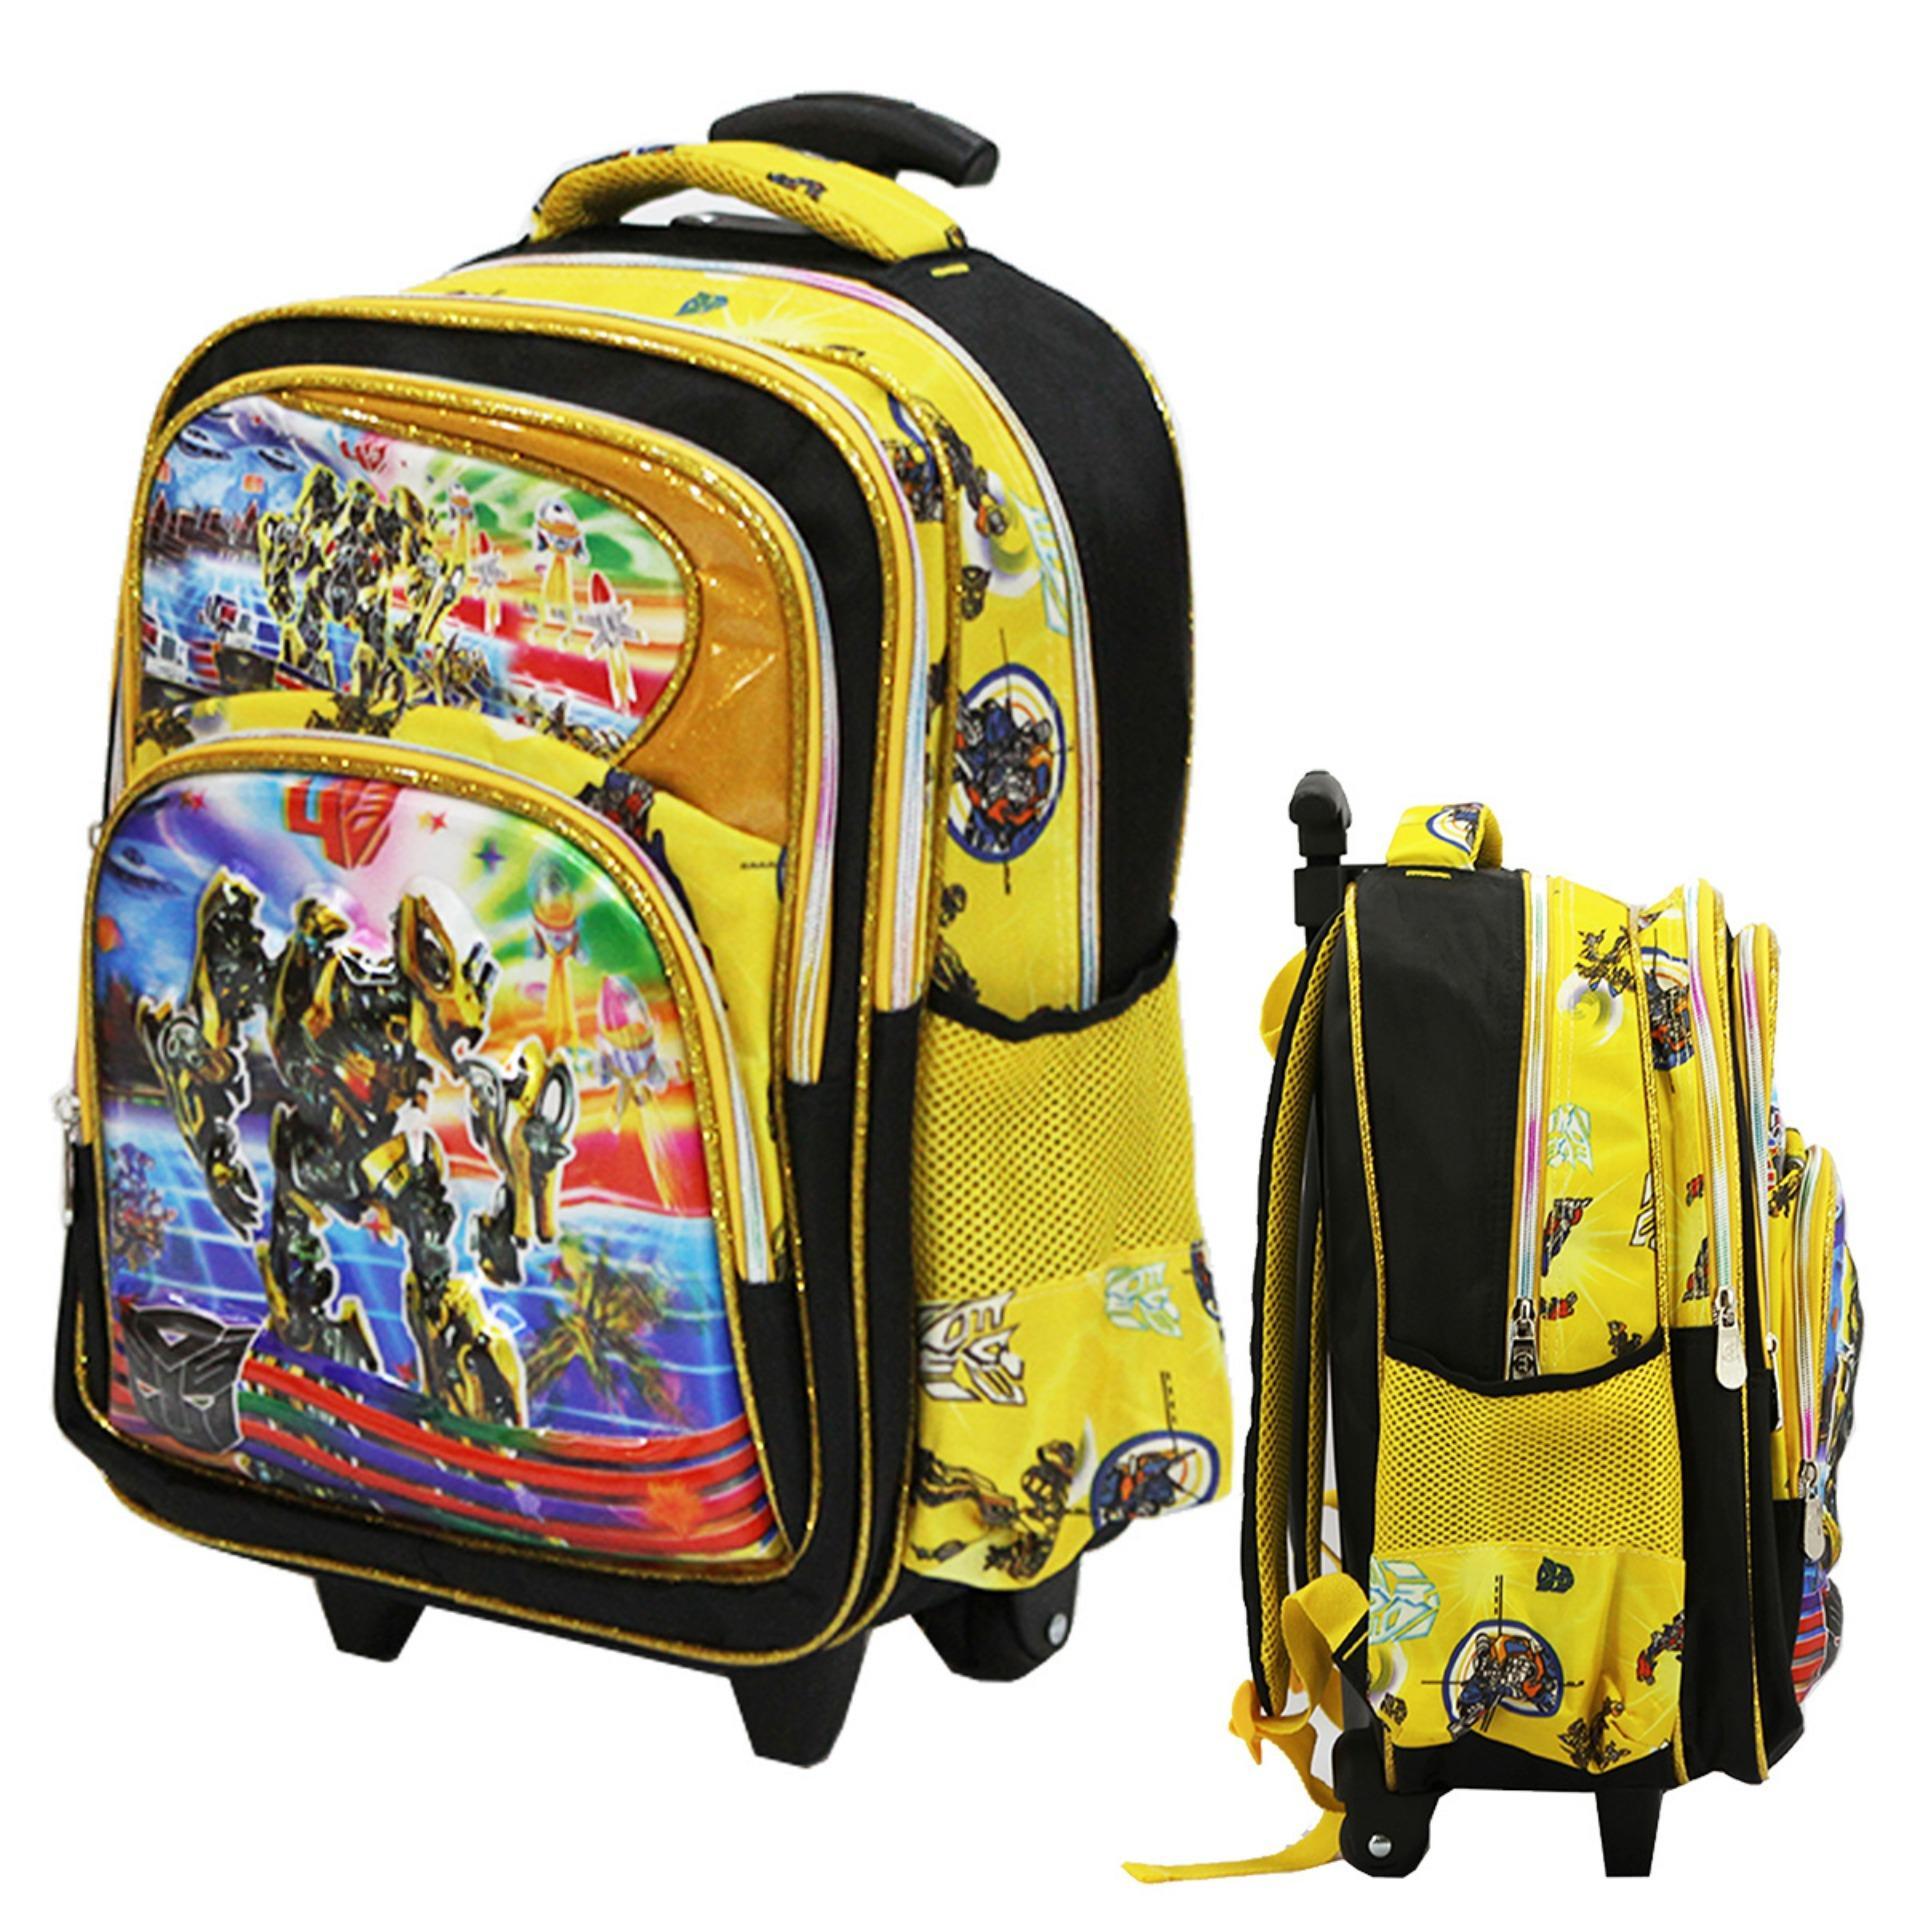 Beli Onlan Tas Trolley Anak Sekolah Sd Transformers Bumble Bee 5D Timbul Hologram Ukuran 4 Kantung Besar Import Yellow Onlan